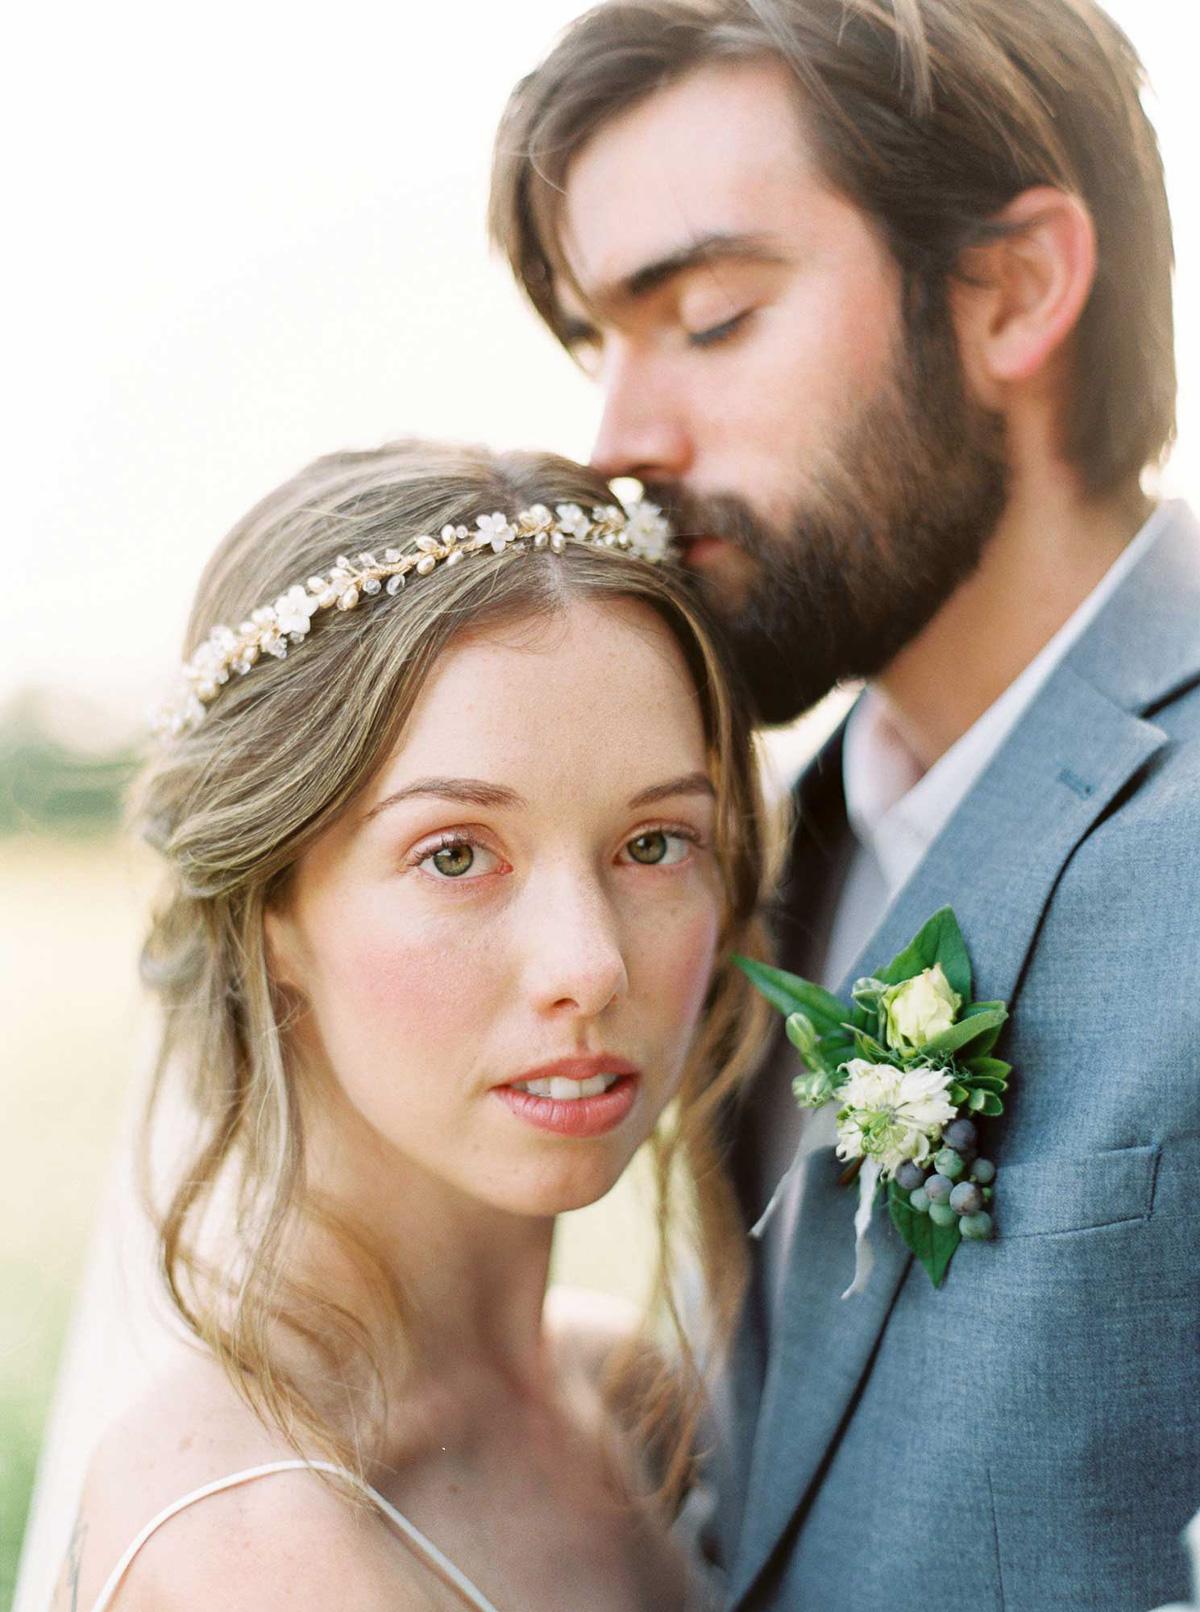 kayla-yestal-vineyard-bride-swish-list-woodland-weddings-niagara-wedding-editorial-20.jpg